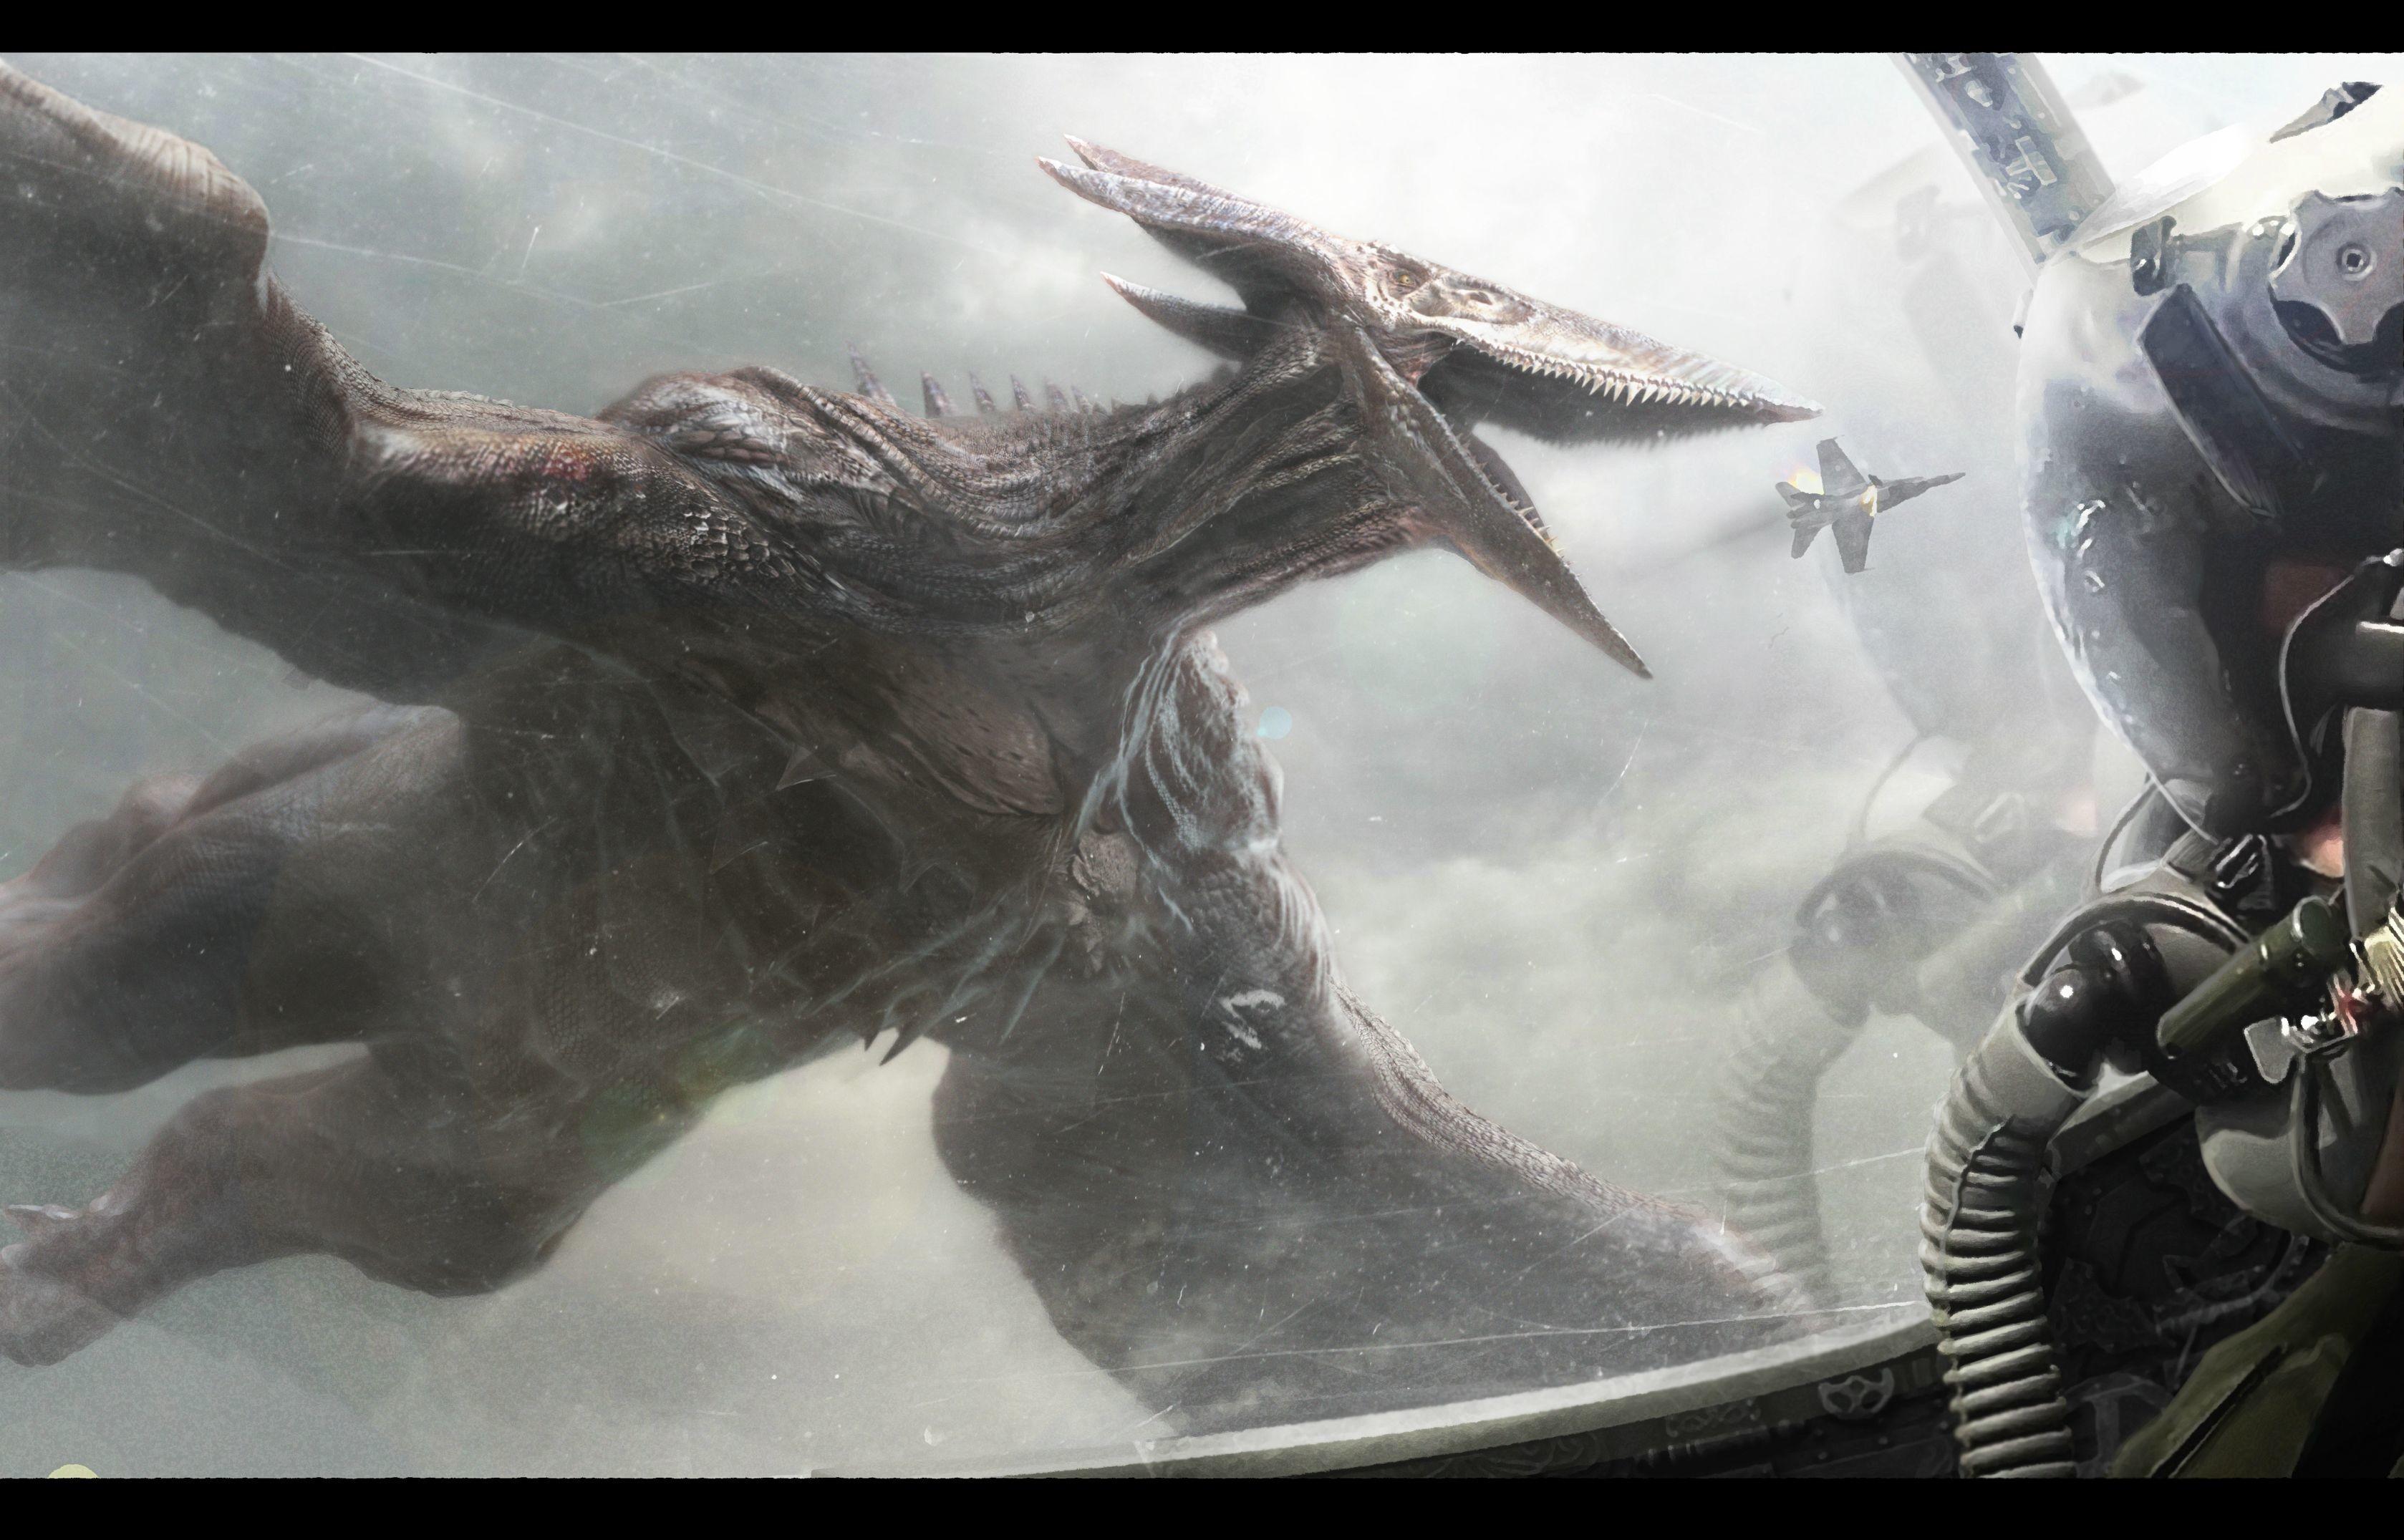 Res: 3357x2151, Mothra Godzilla 2014